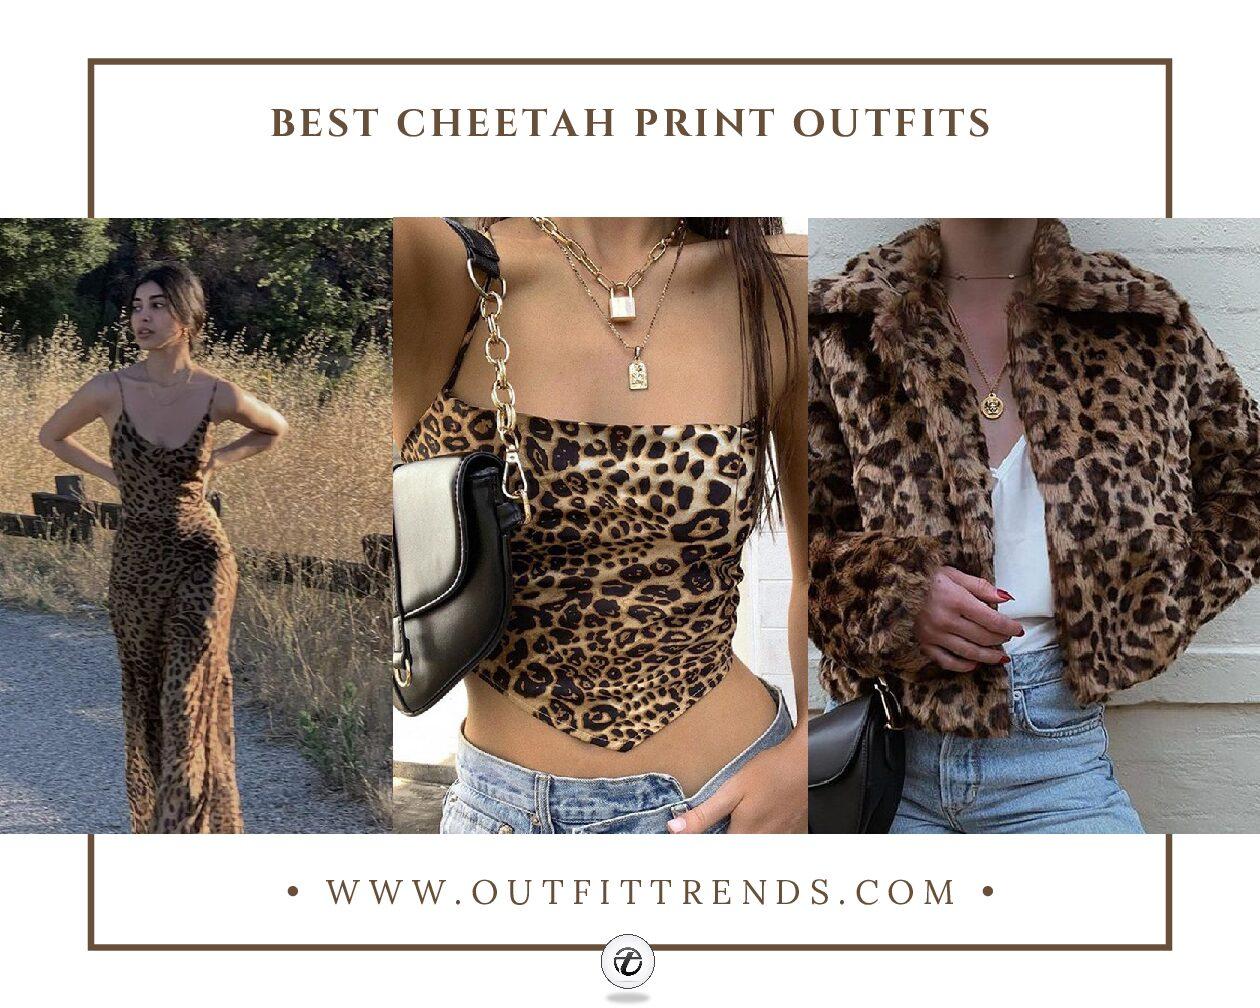 Cheetah Print Outfits 12 Ways to Wear Cheetah Print